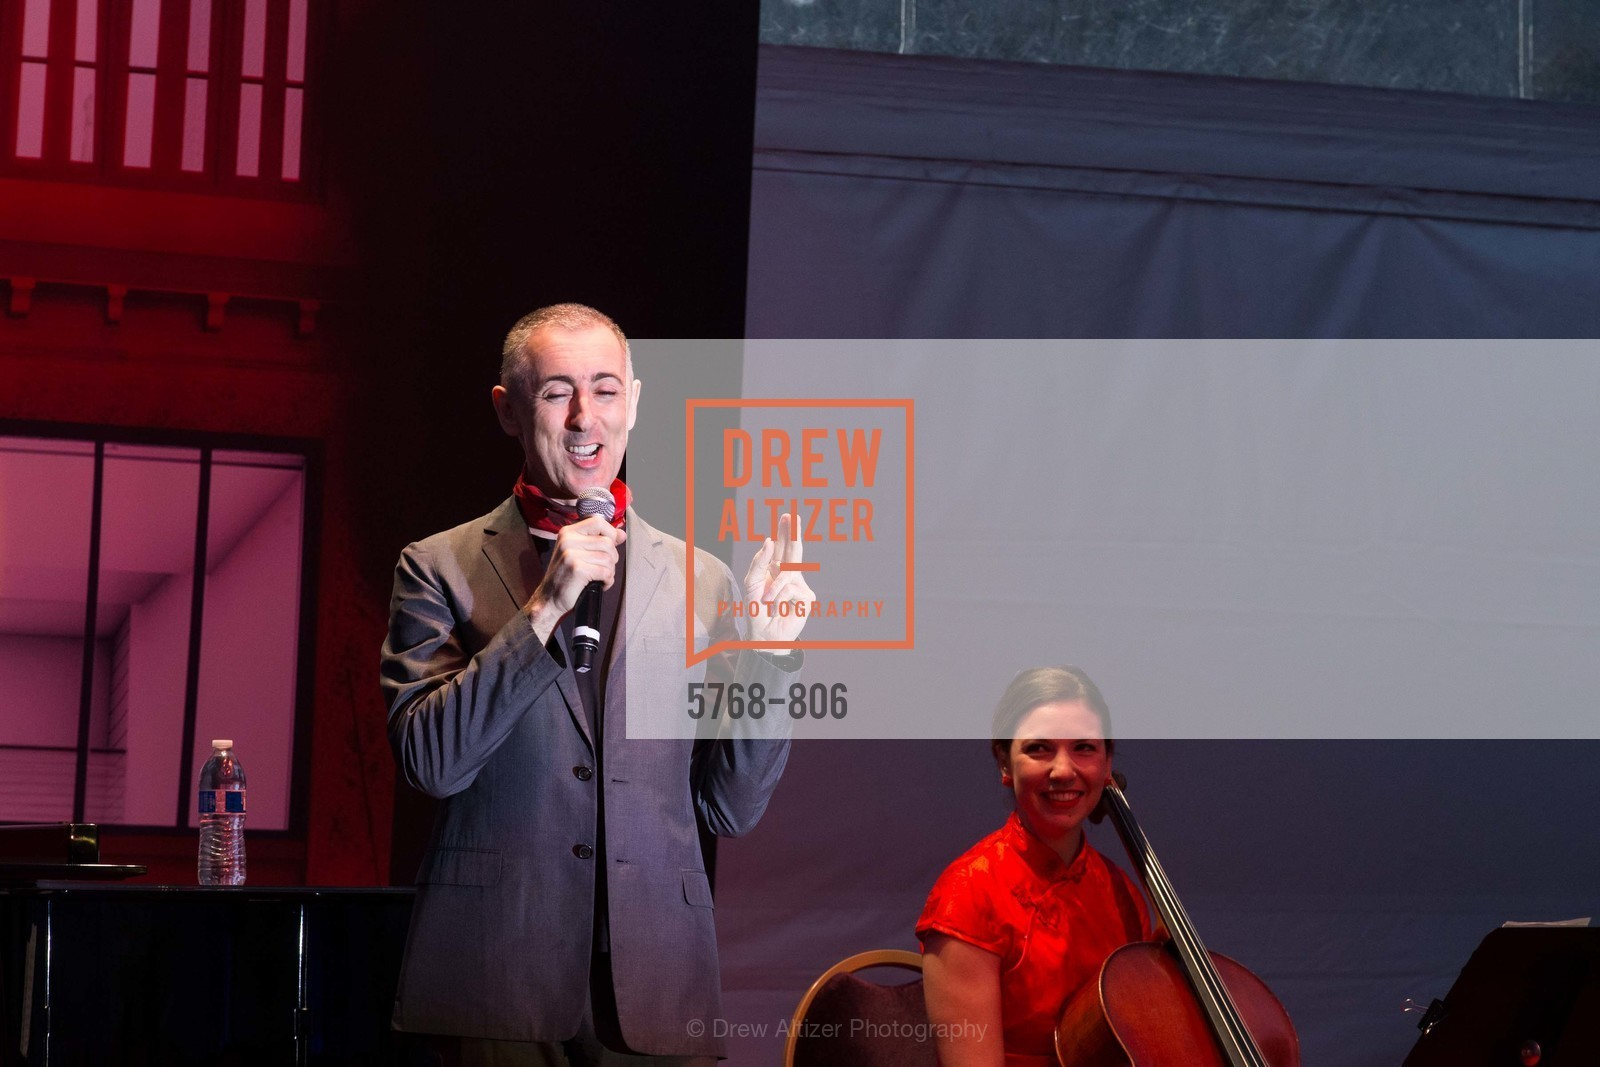 Performance By Alan Cumming, Photo #5768-806